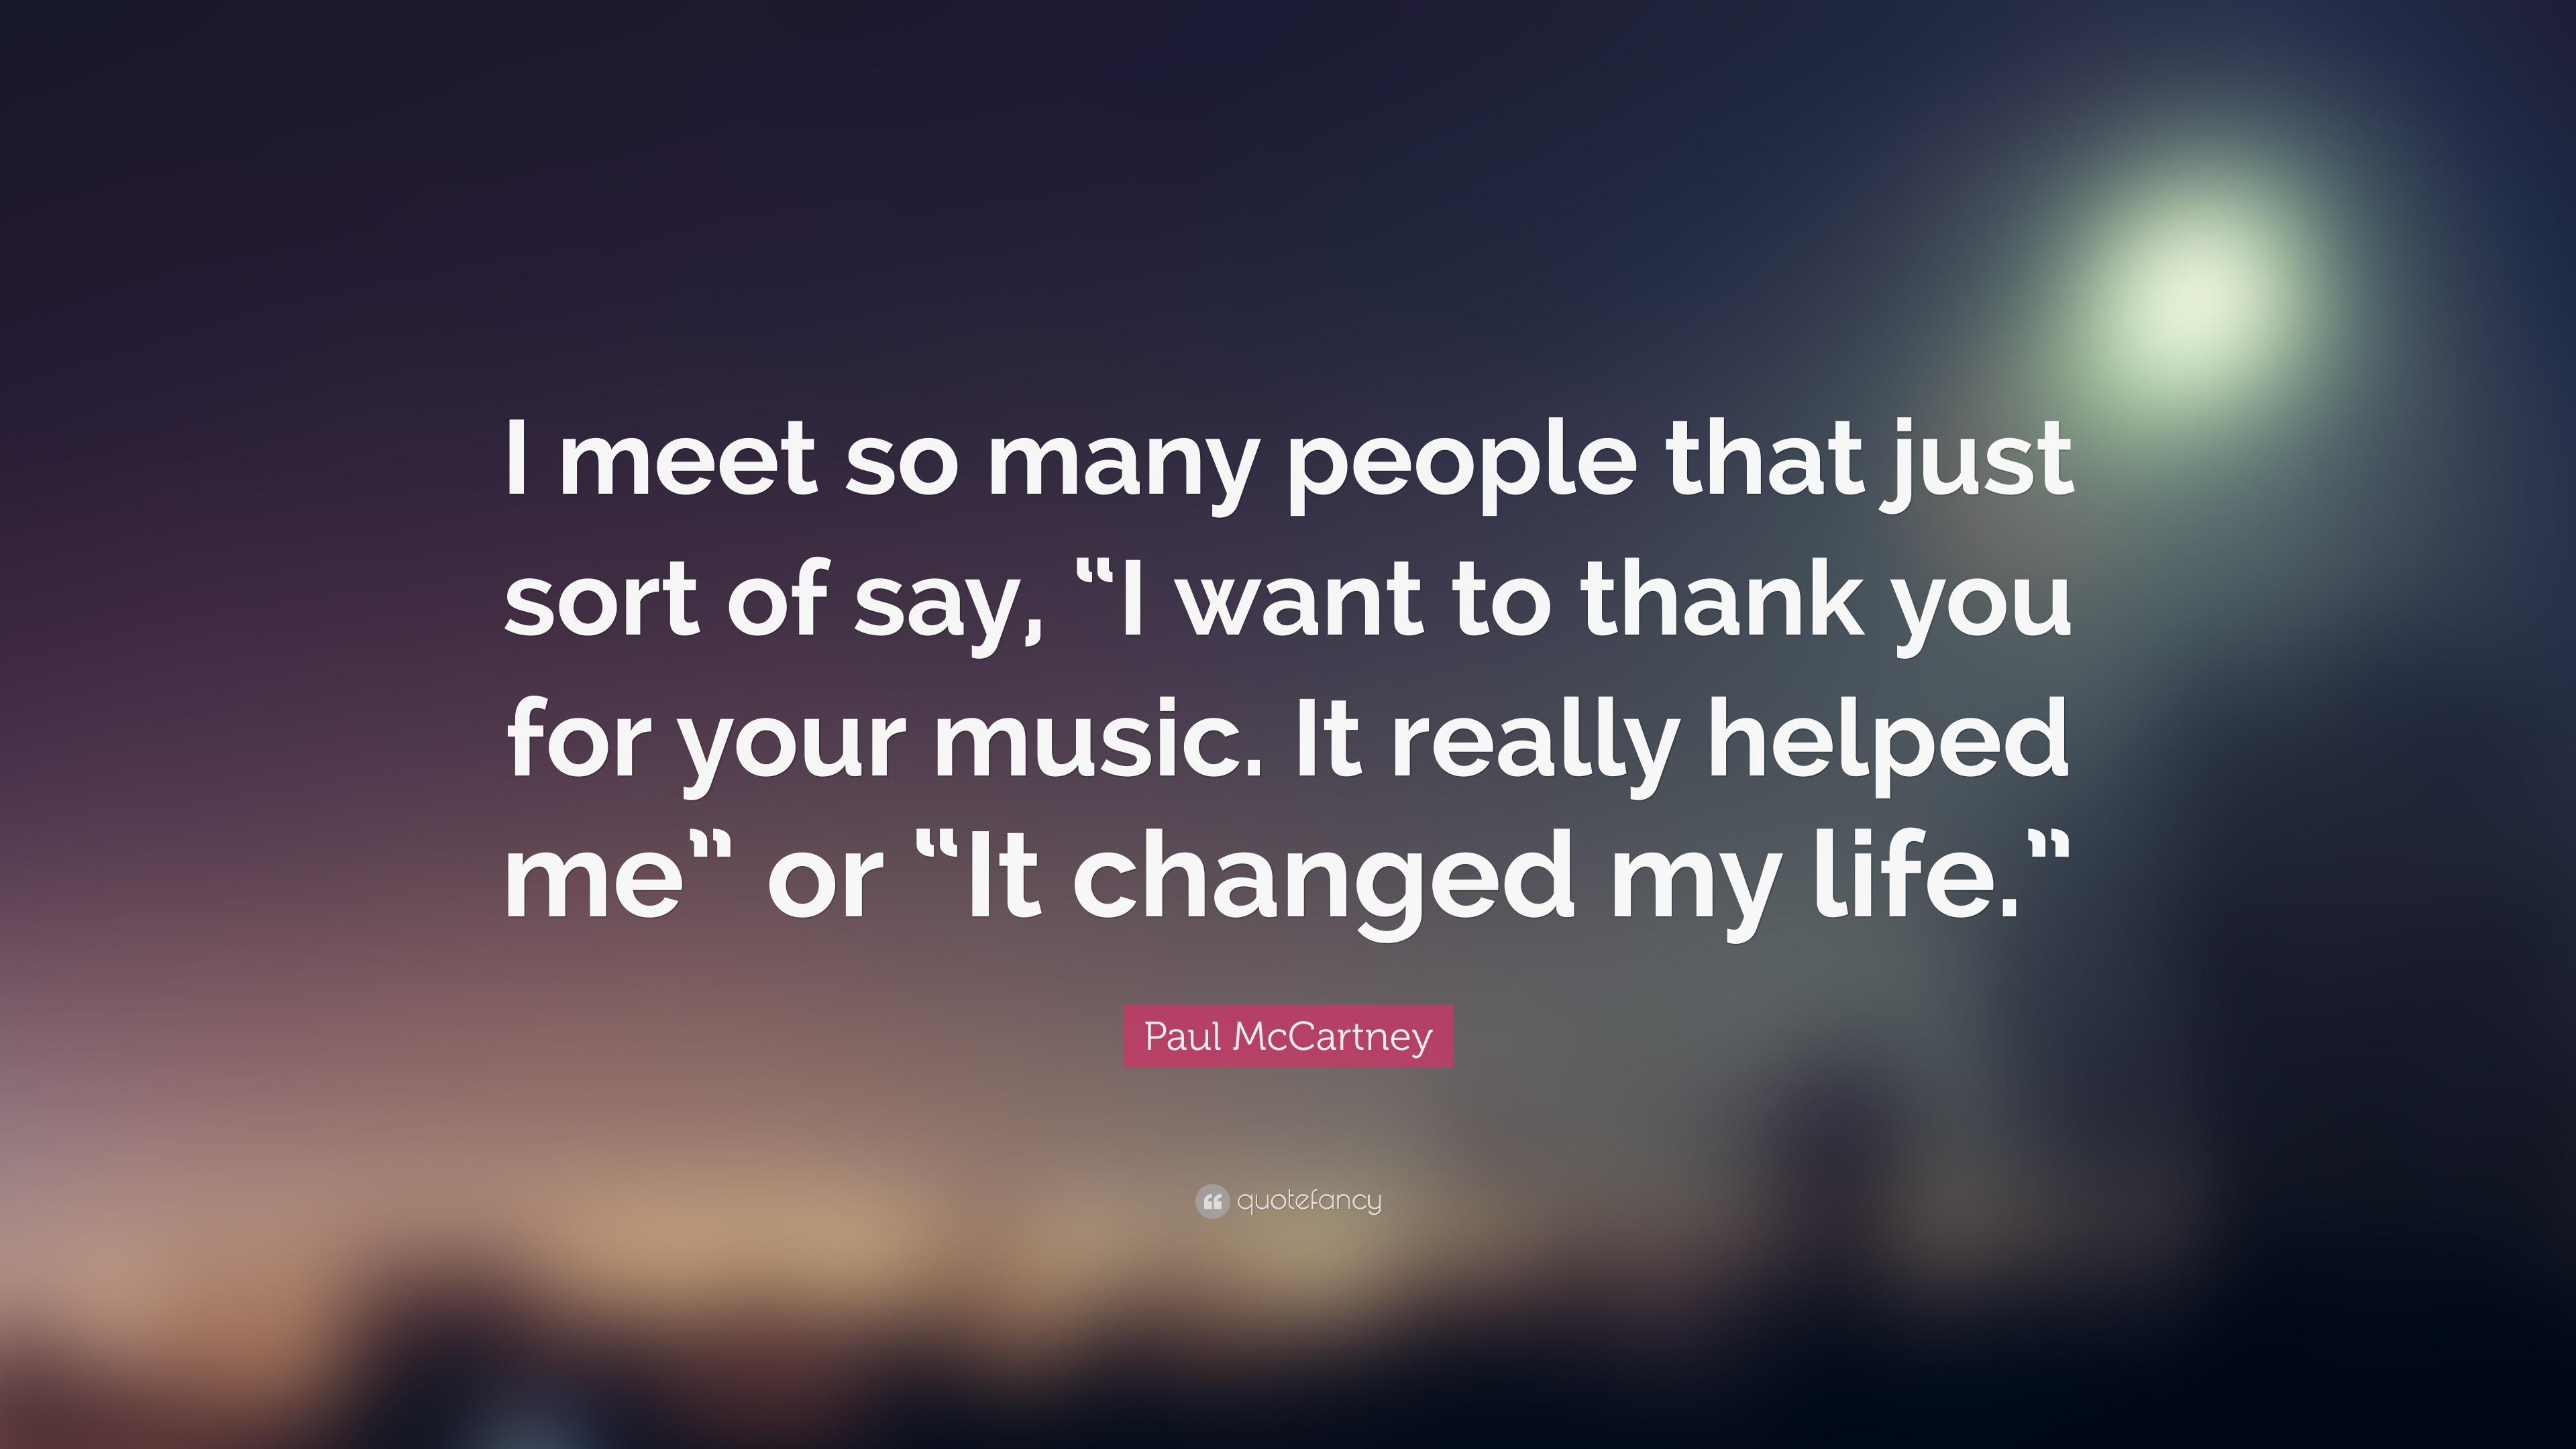 music changed my life